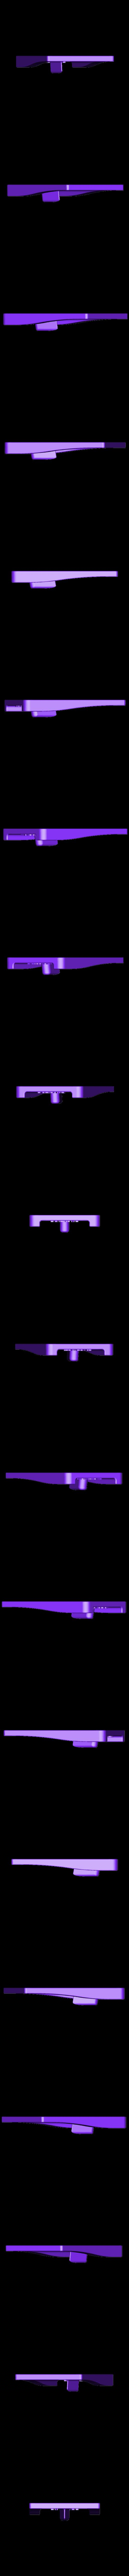 enforce_32_screws.stl Download free STL file Tool Holder for Wrecking Bar Small (325mm) 036 I ENFORCE I for screws or peg board • 3D printing template, Wiesemann1893